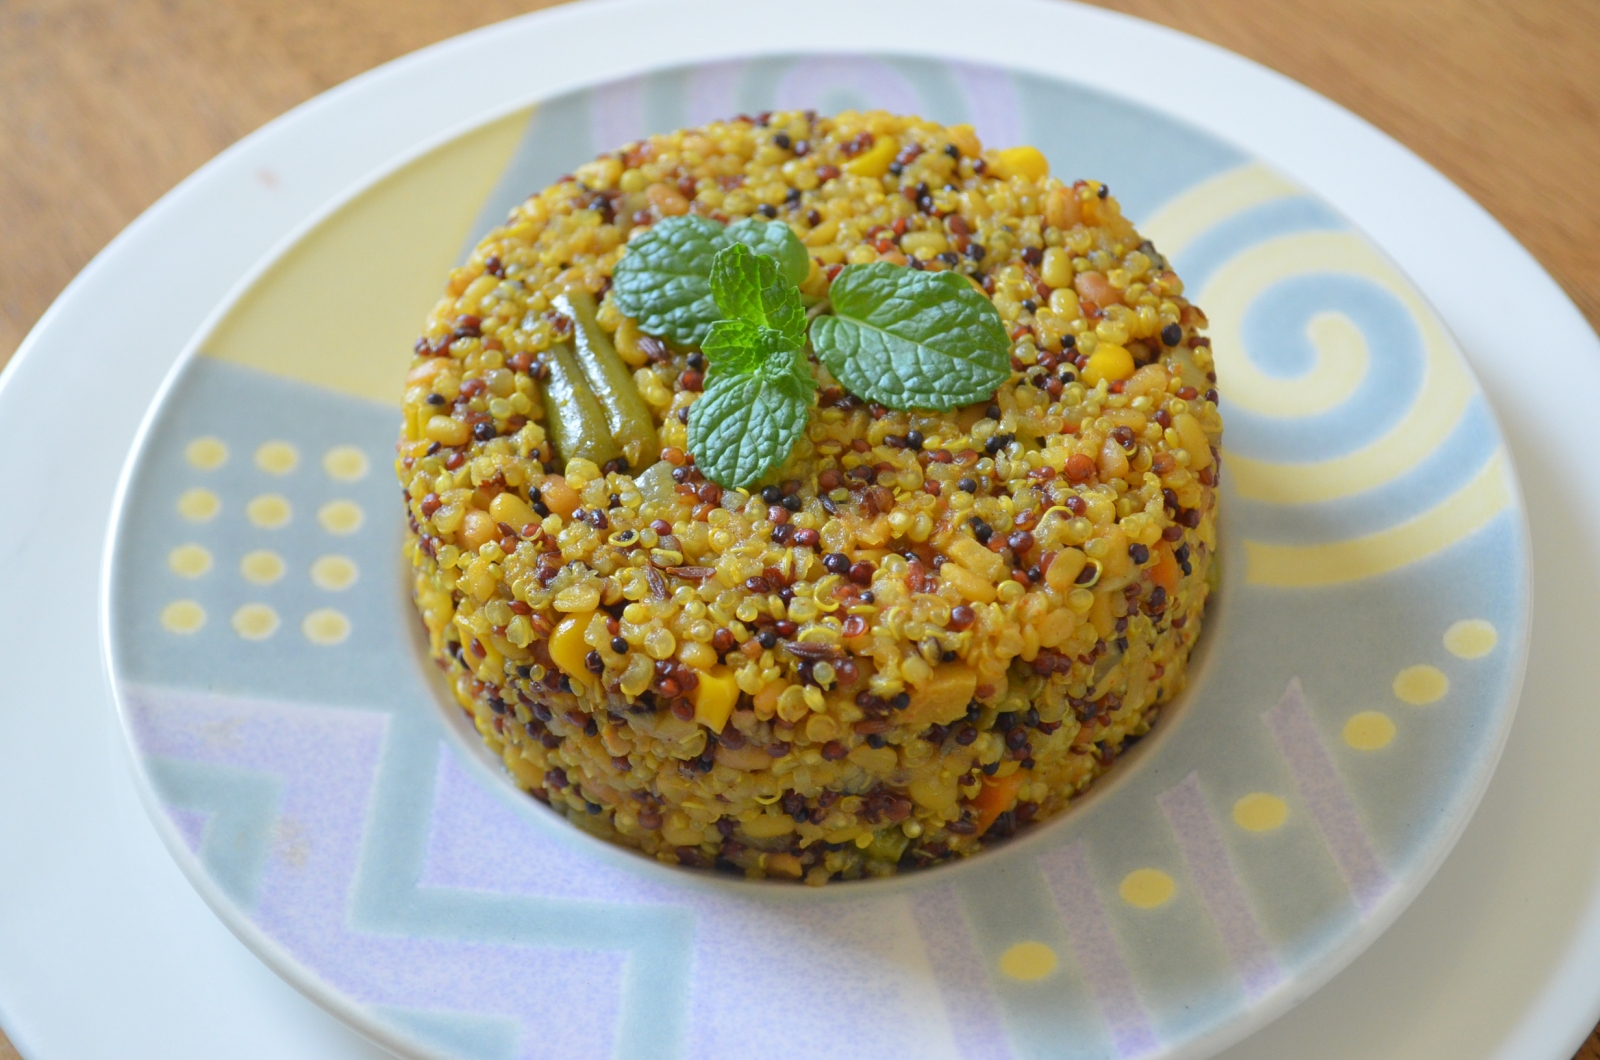 Quinoa vegetable upma recipe by archanas kitchen quinoa vegetable upma recipe forumfinder Image collections